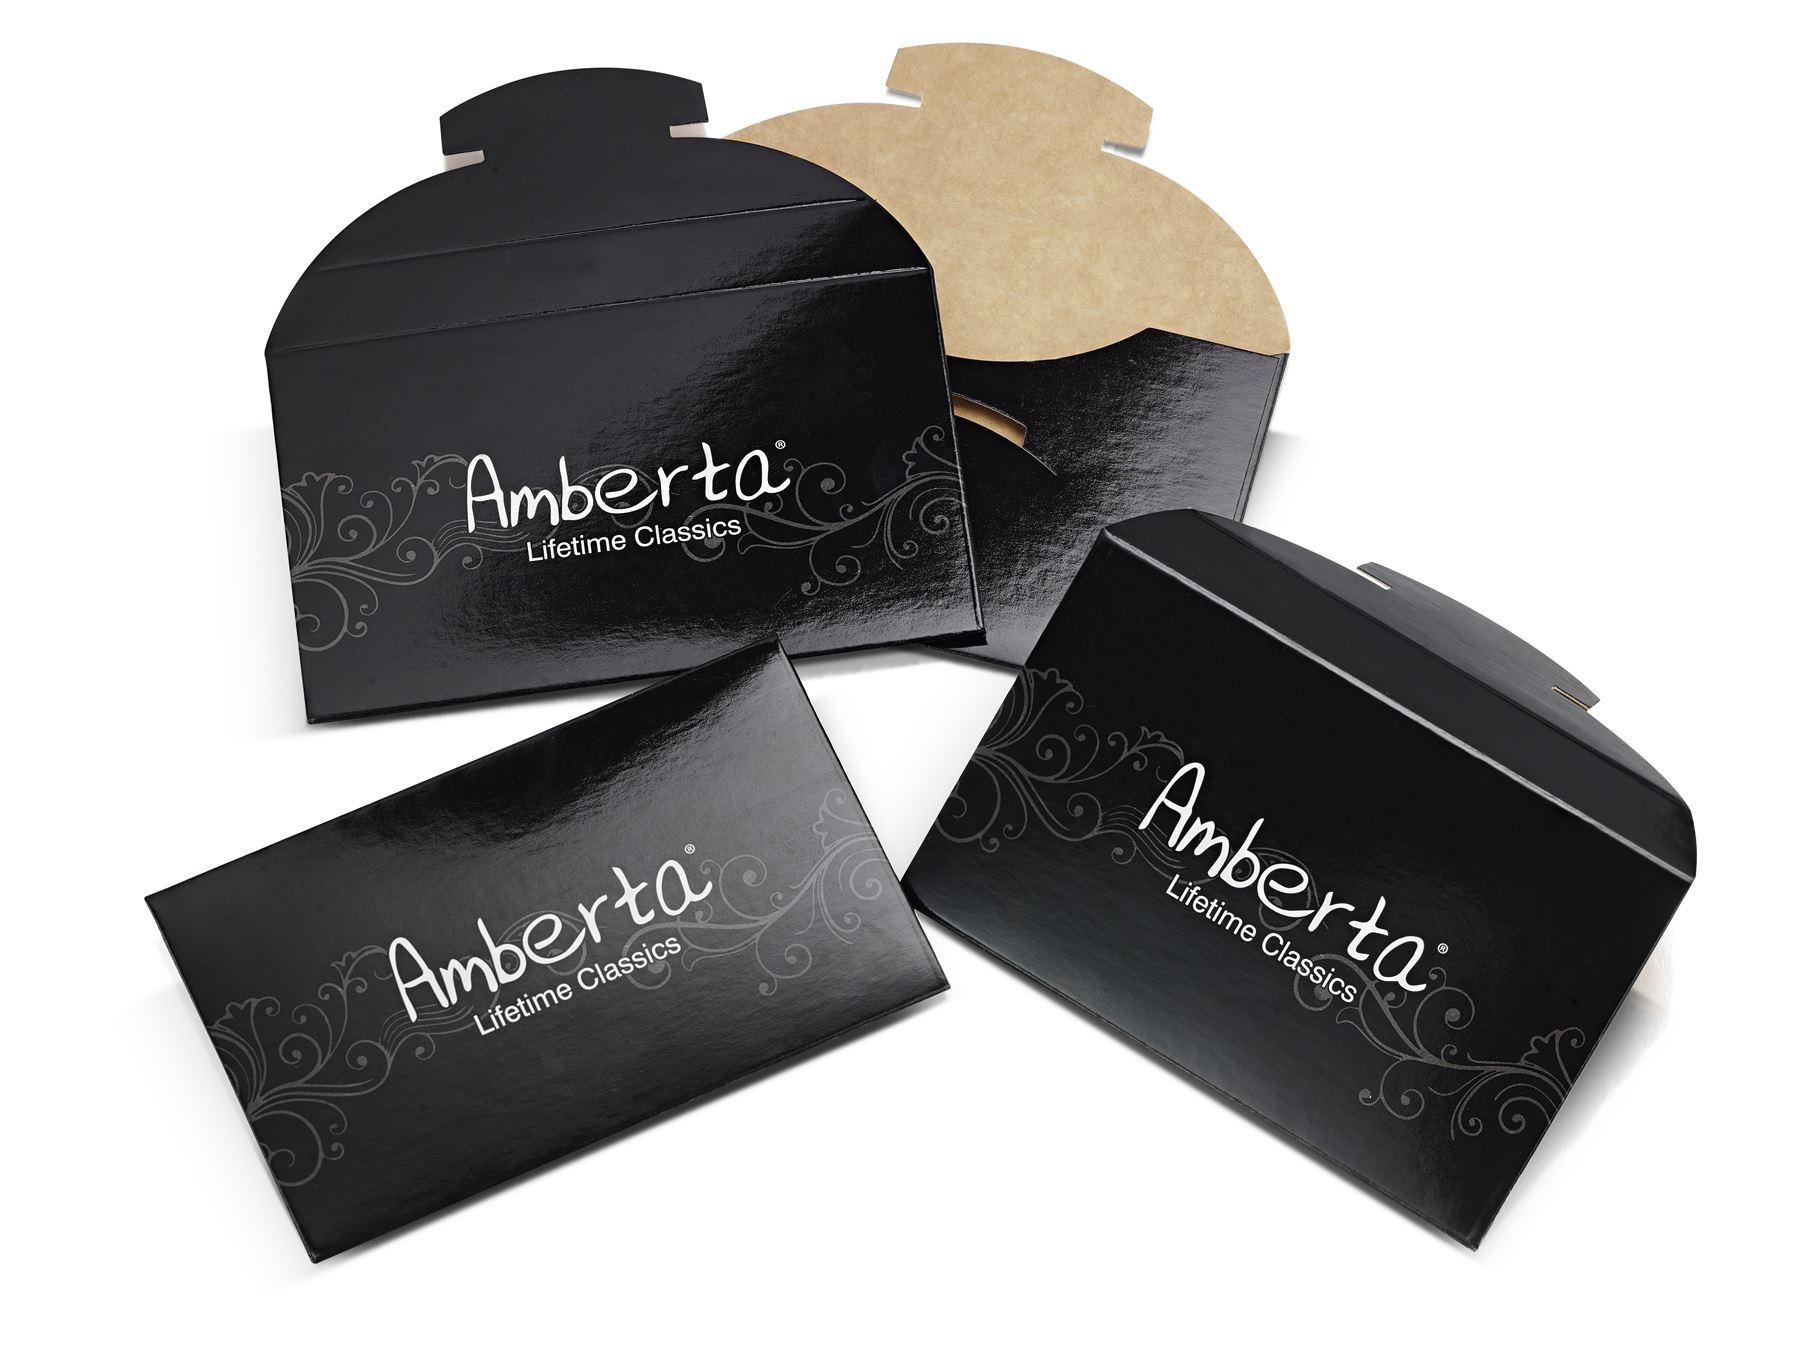 Amberta-Jewelry-925-Sterling-Silver-Adjustable-Bracelet-Italian-Bangle-for-Women thumbnail 13